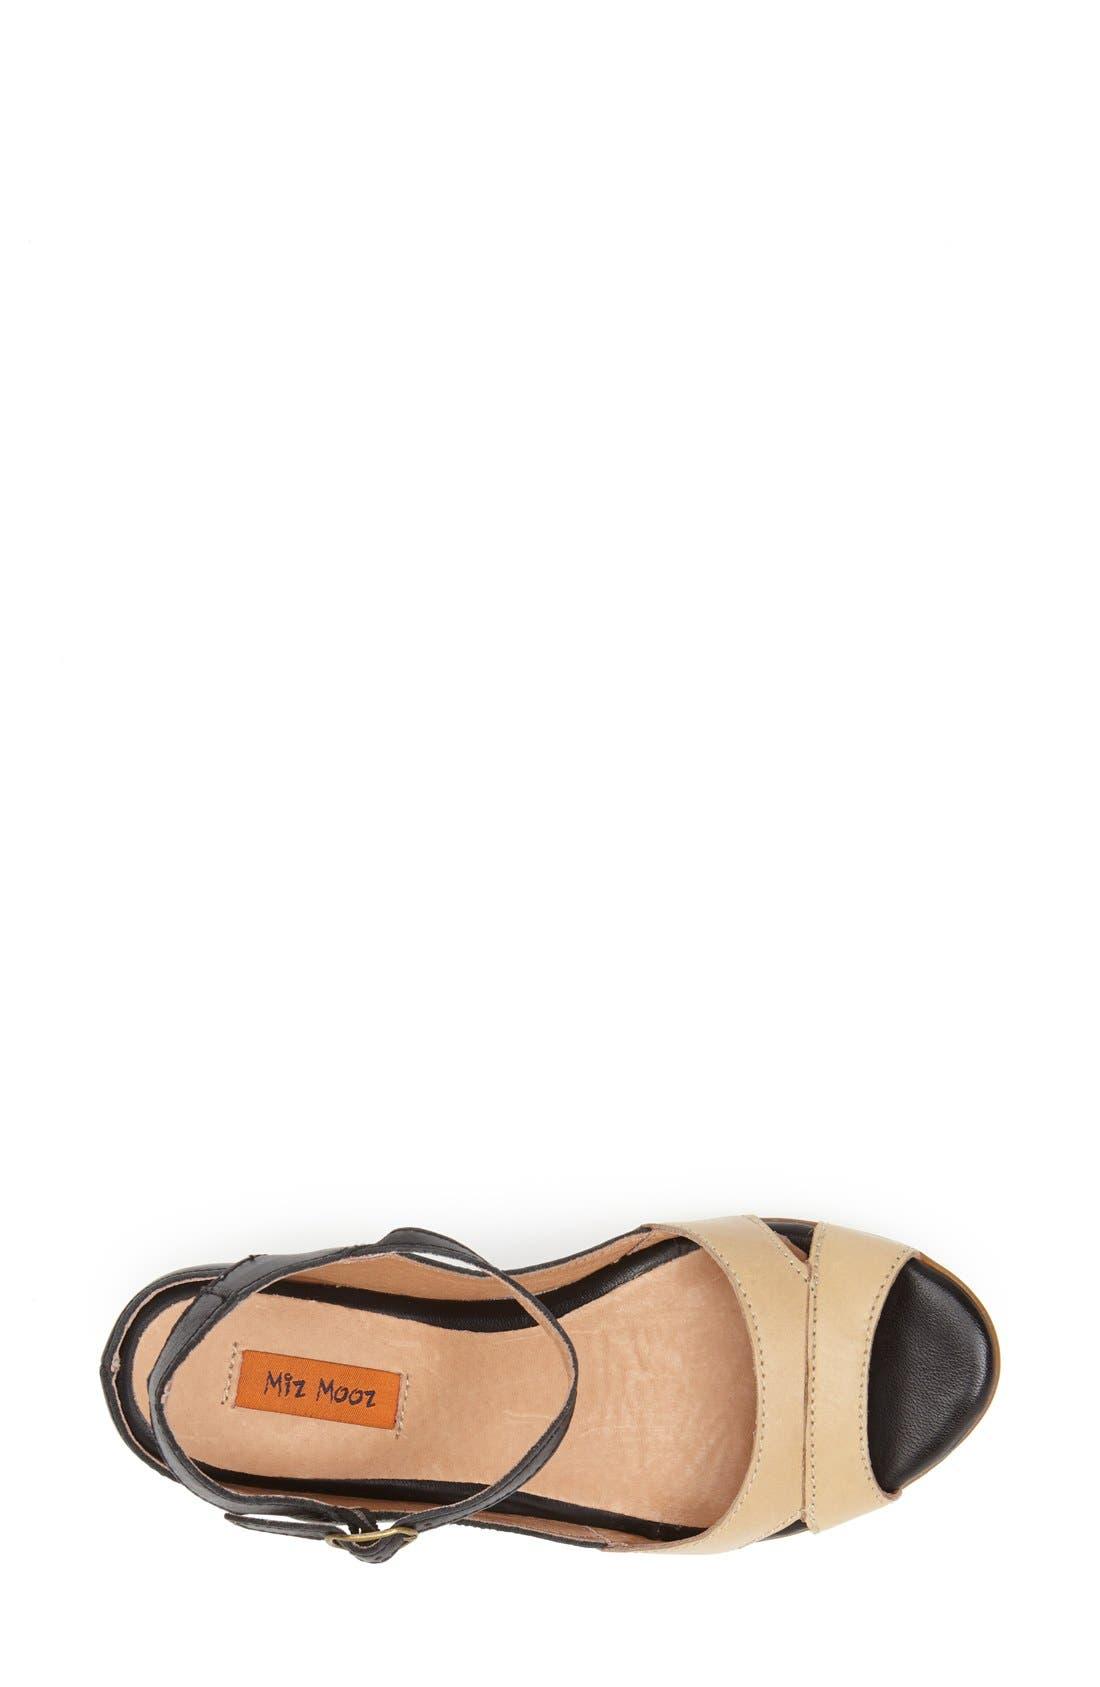 Alternate Image 3  - Miz Mooz Footwear 'Cosette' Wedge Sandal (Women)